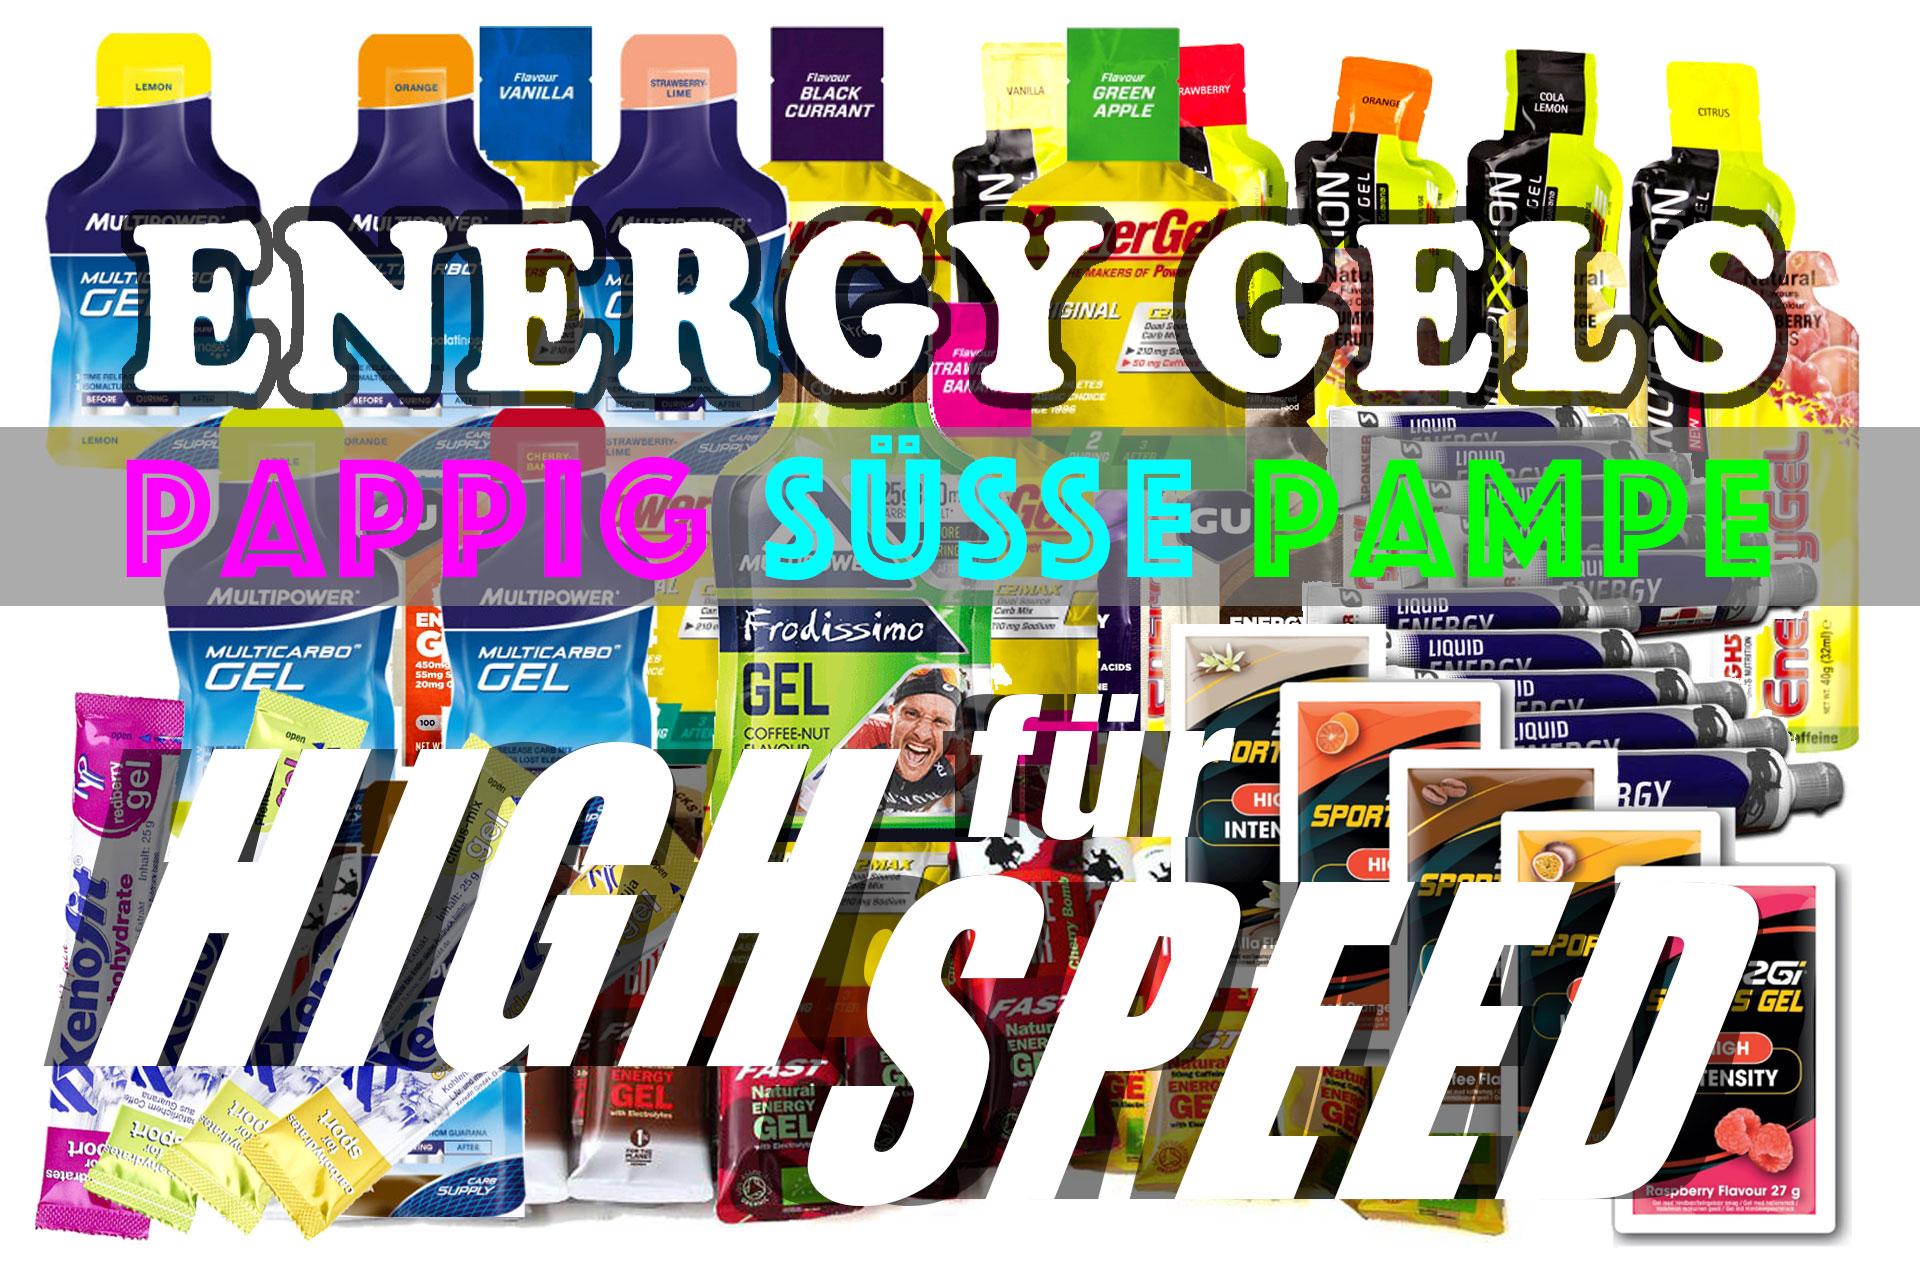 ENERGY GELS: Pappig süsse Pampe für Highspeed © stefandrexl.de